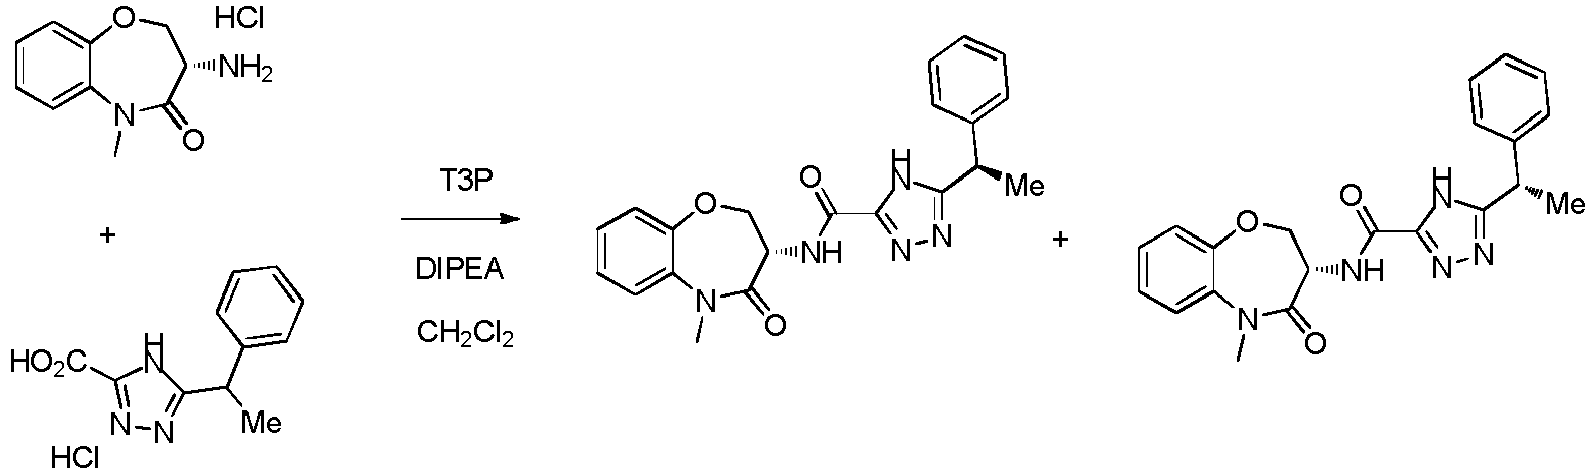 Figure imgb0479